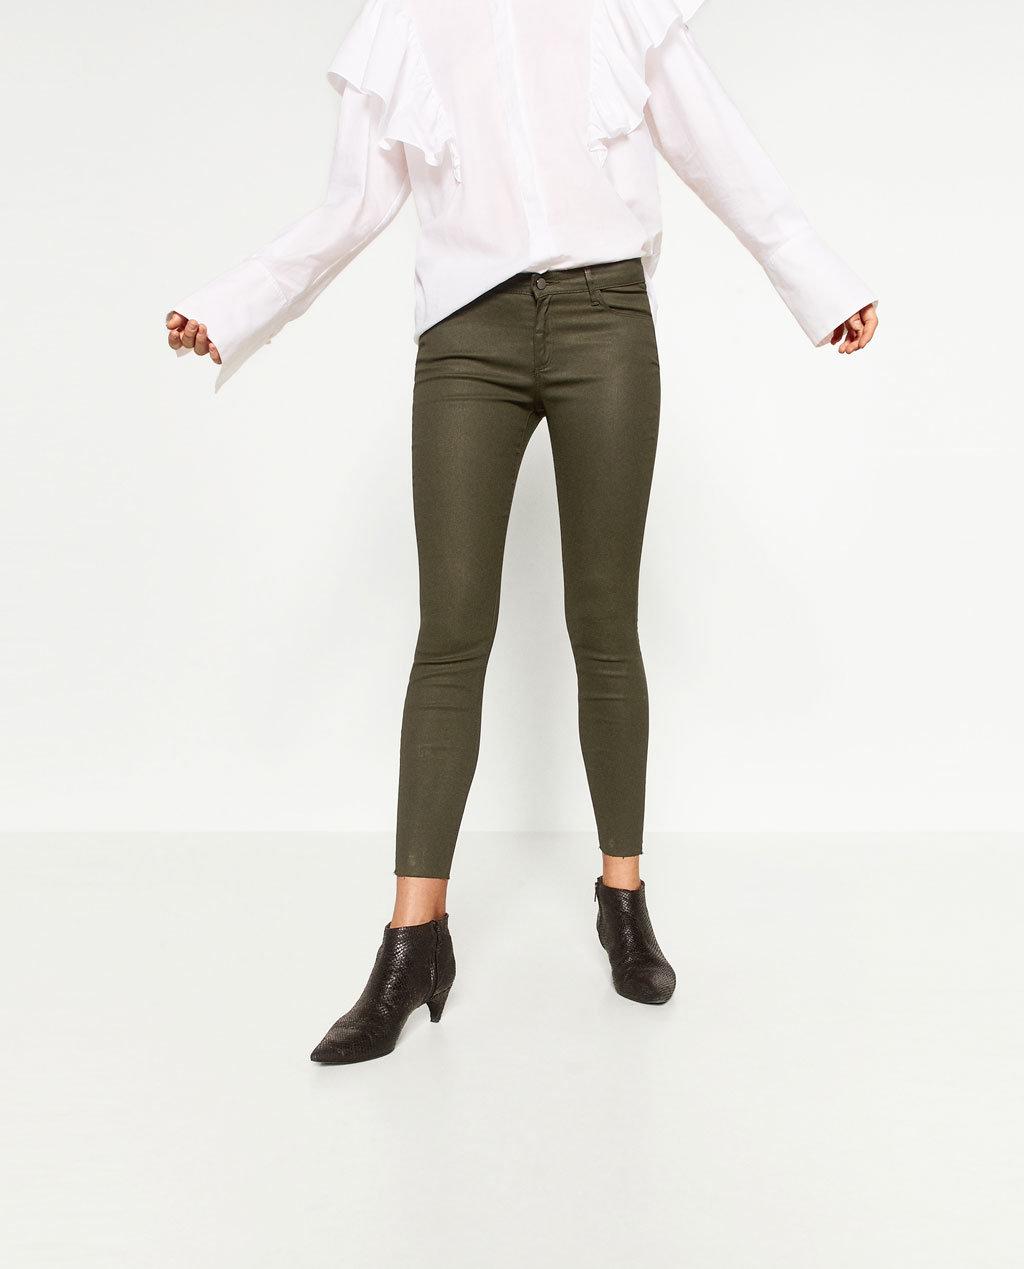 Fashioned Women Skinny Trousers